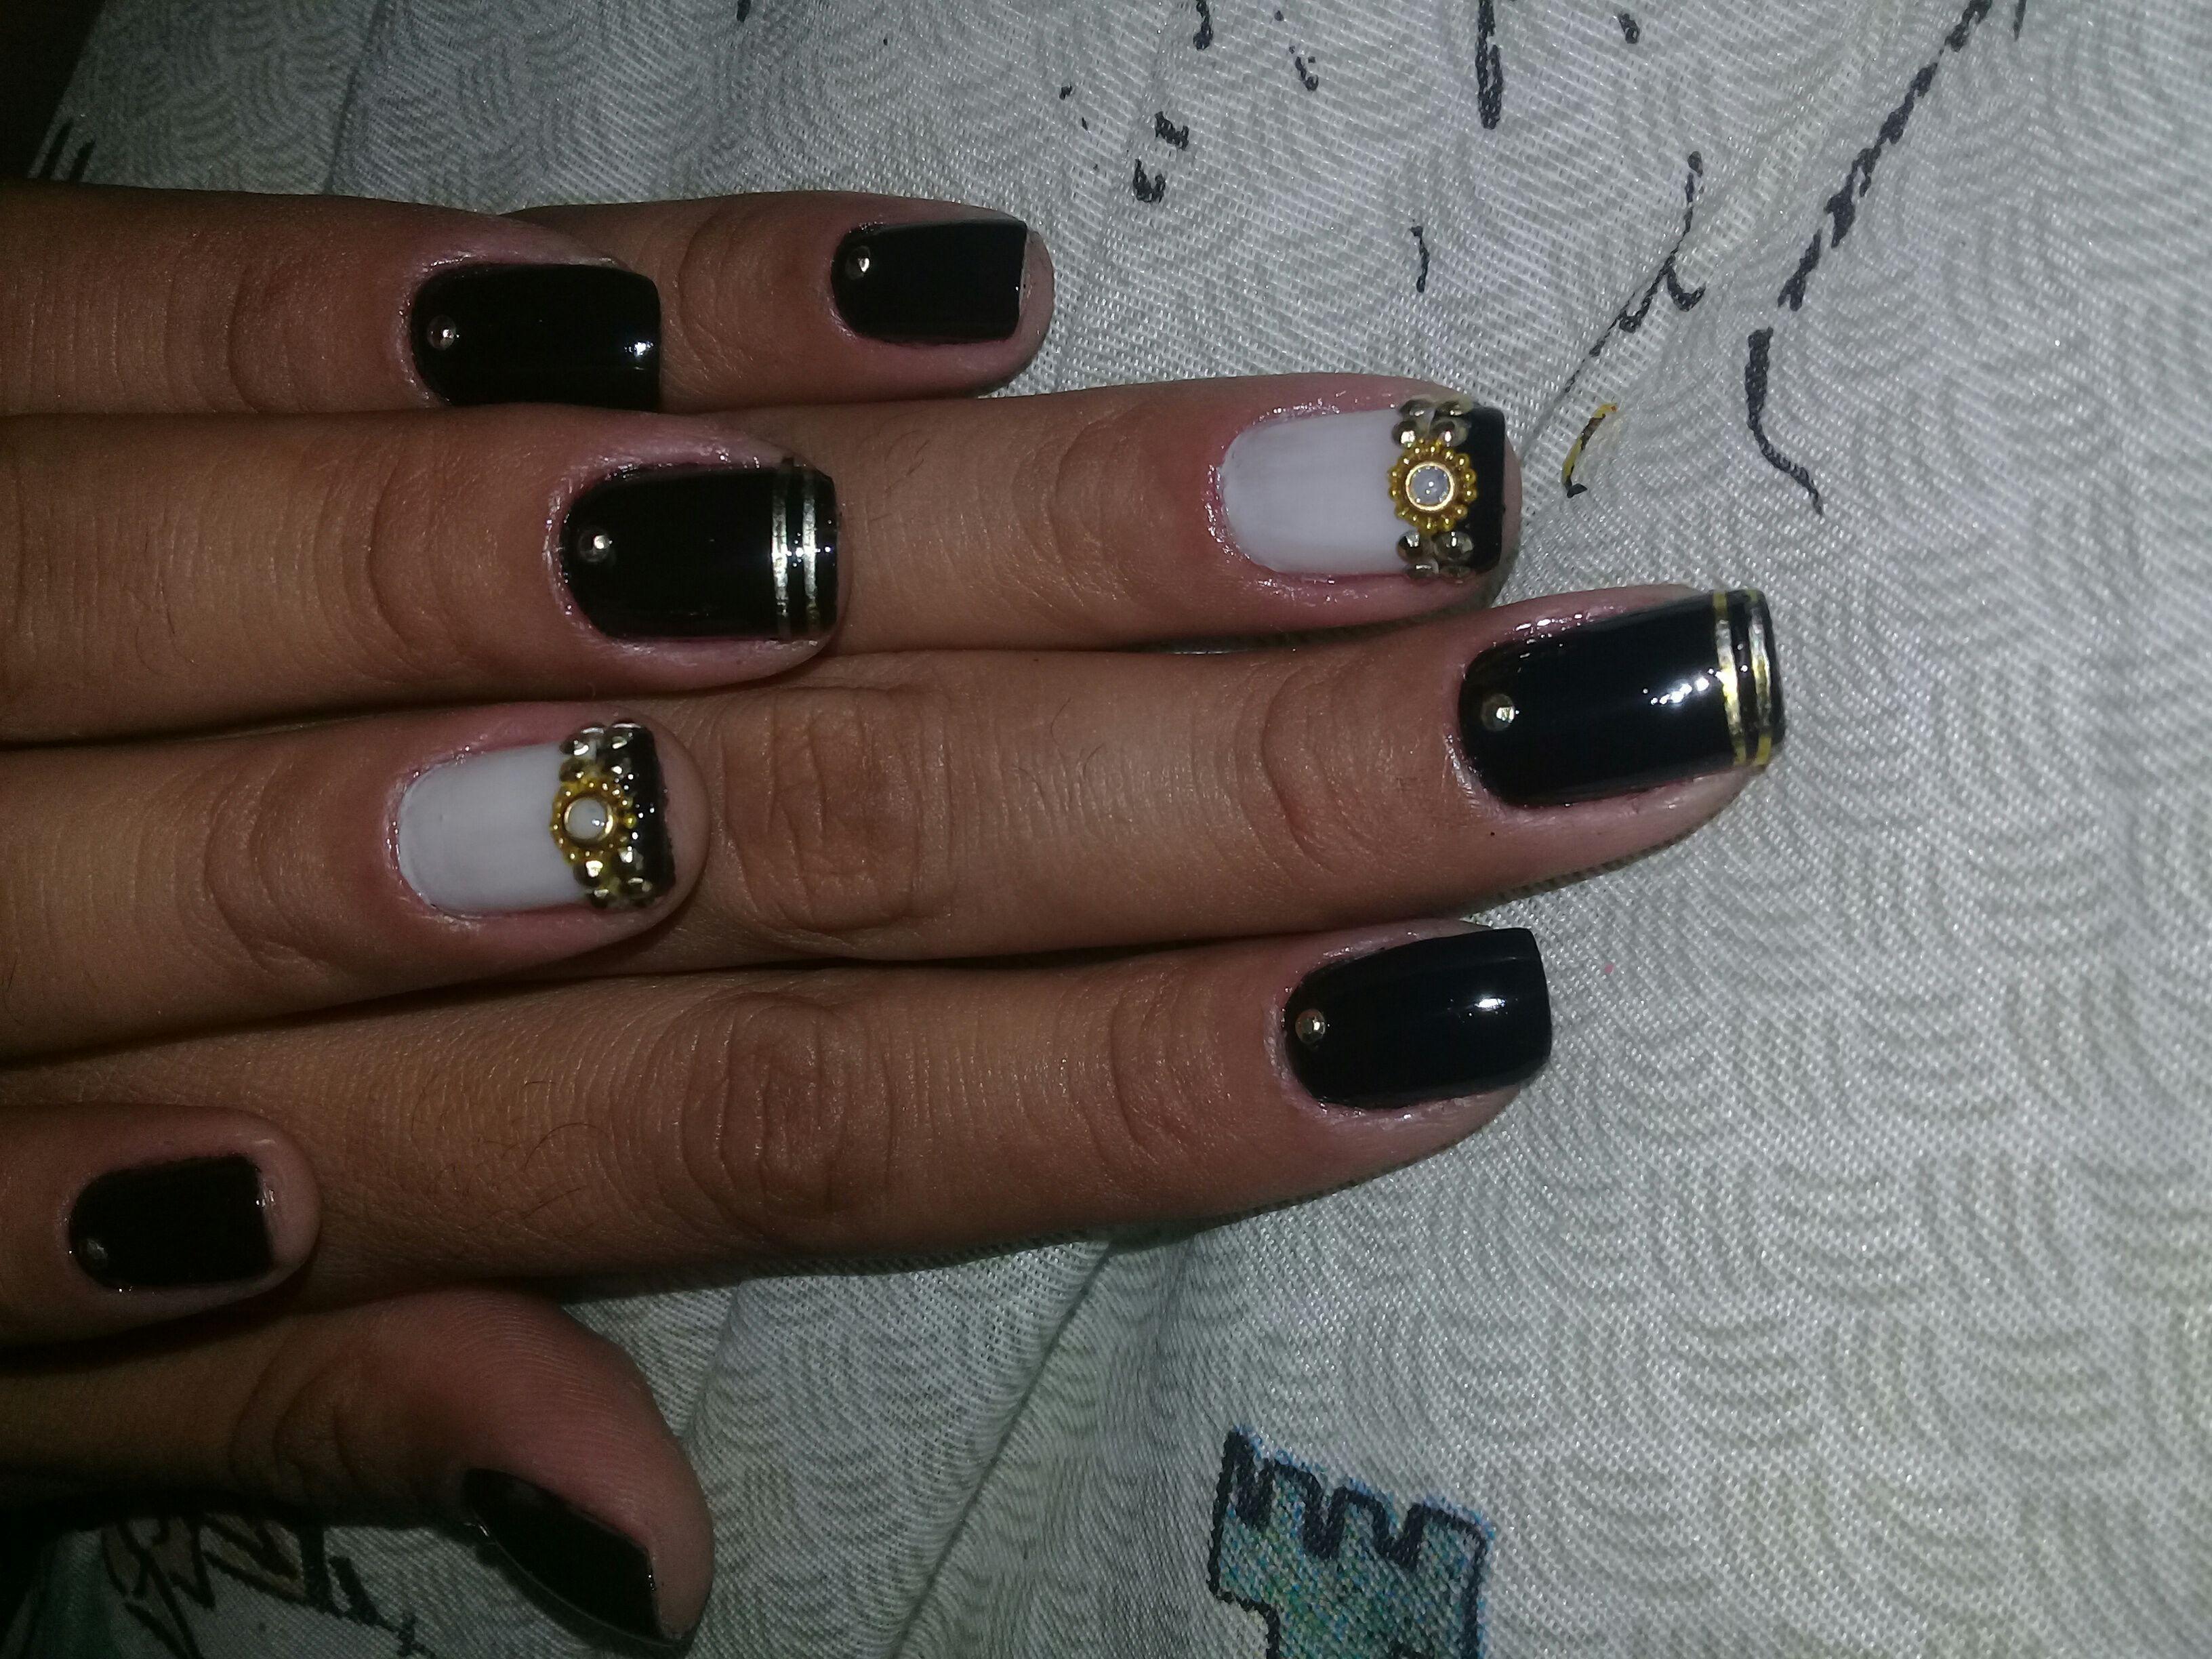 manicure e pedicure manicure e pedicure manicure e pedicure manicure e pedicure